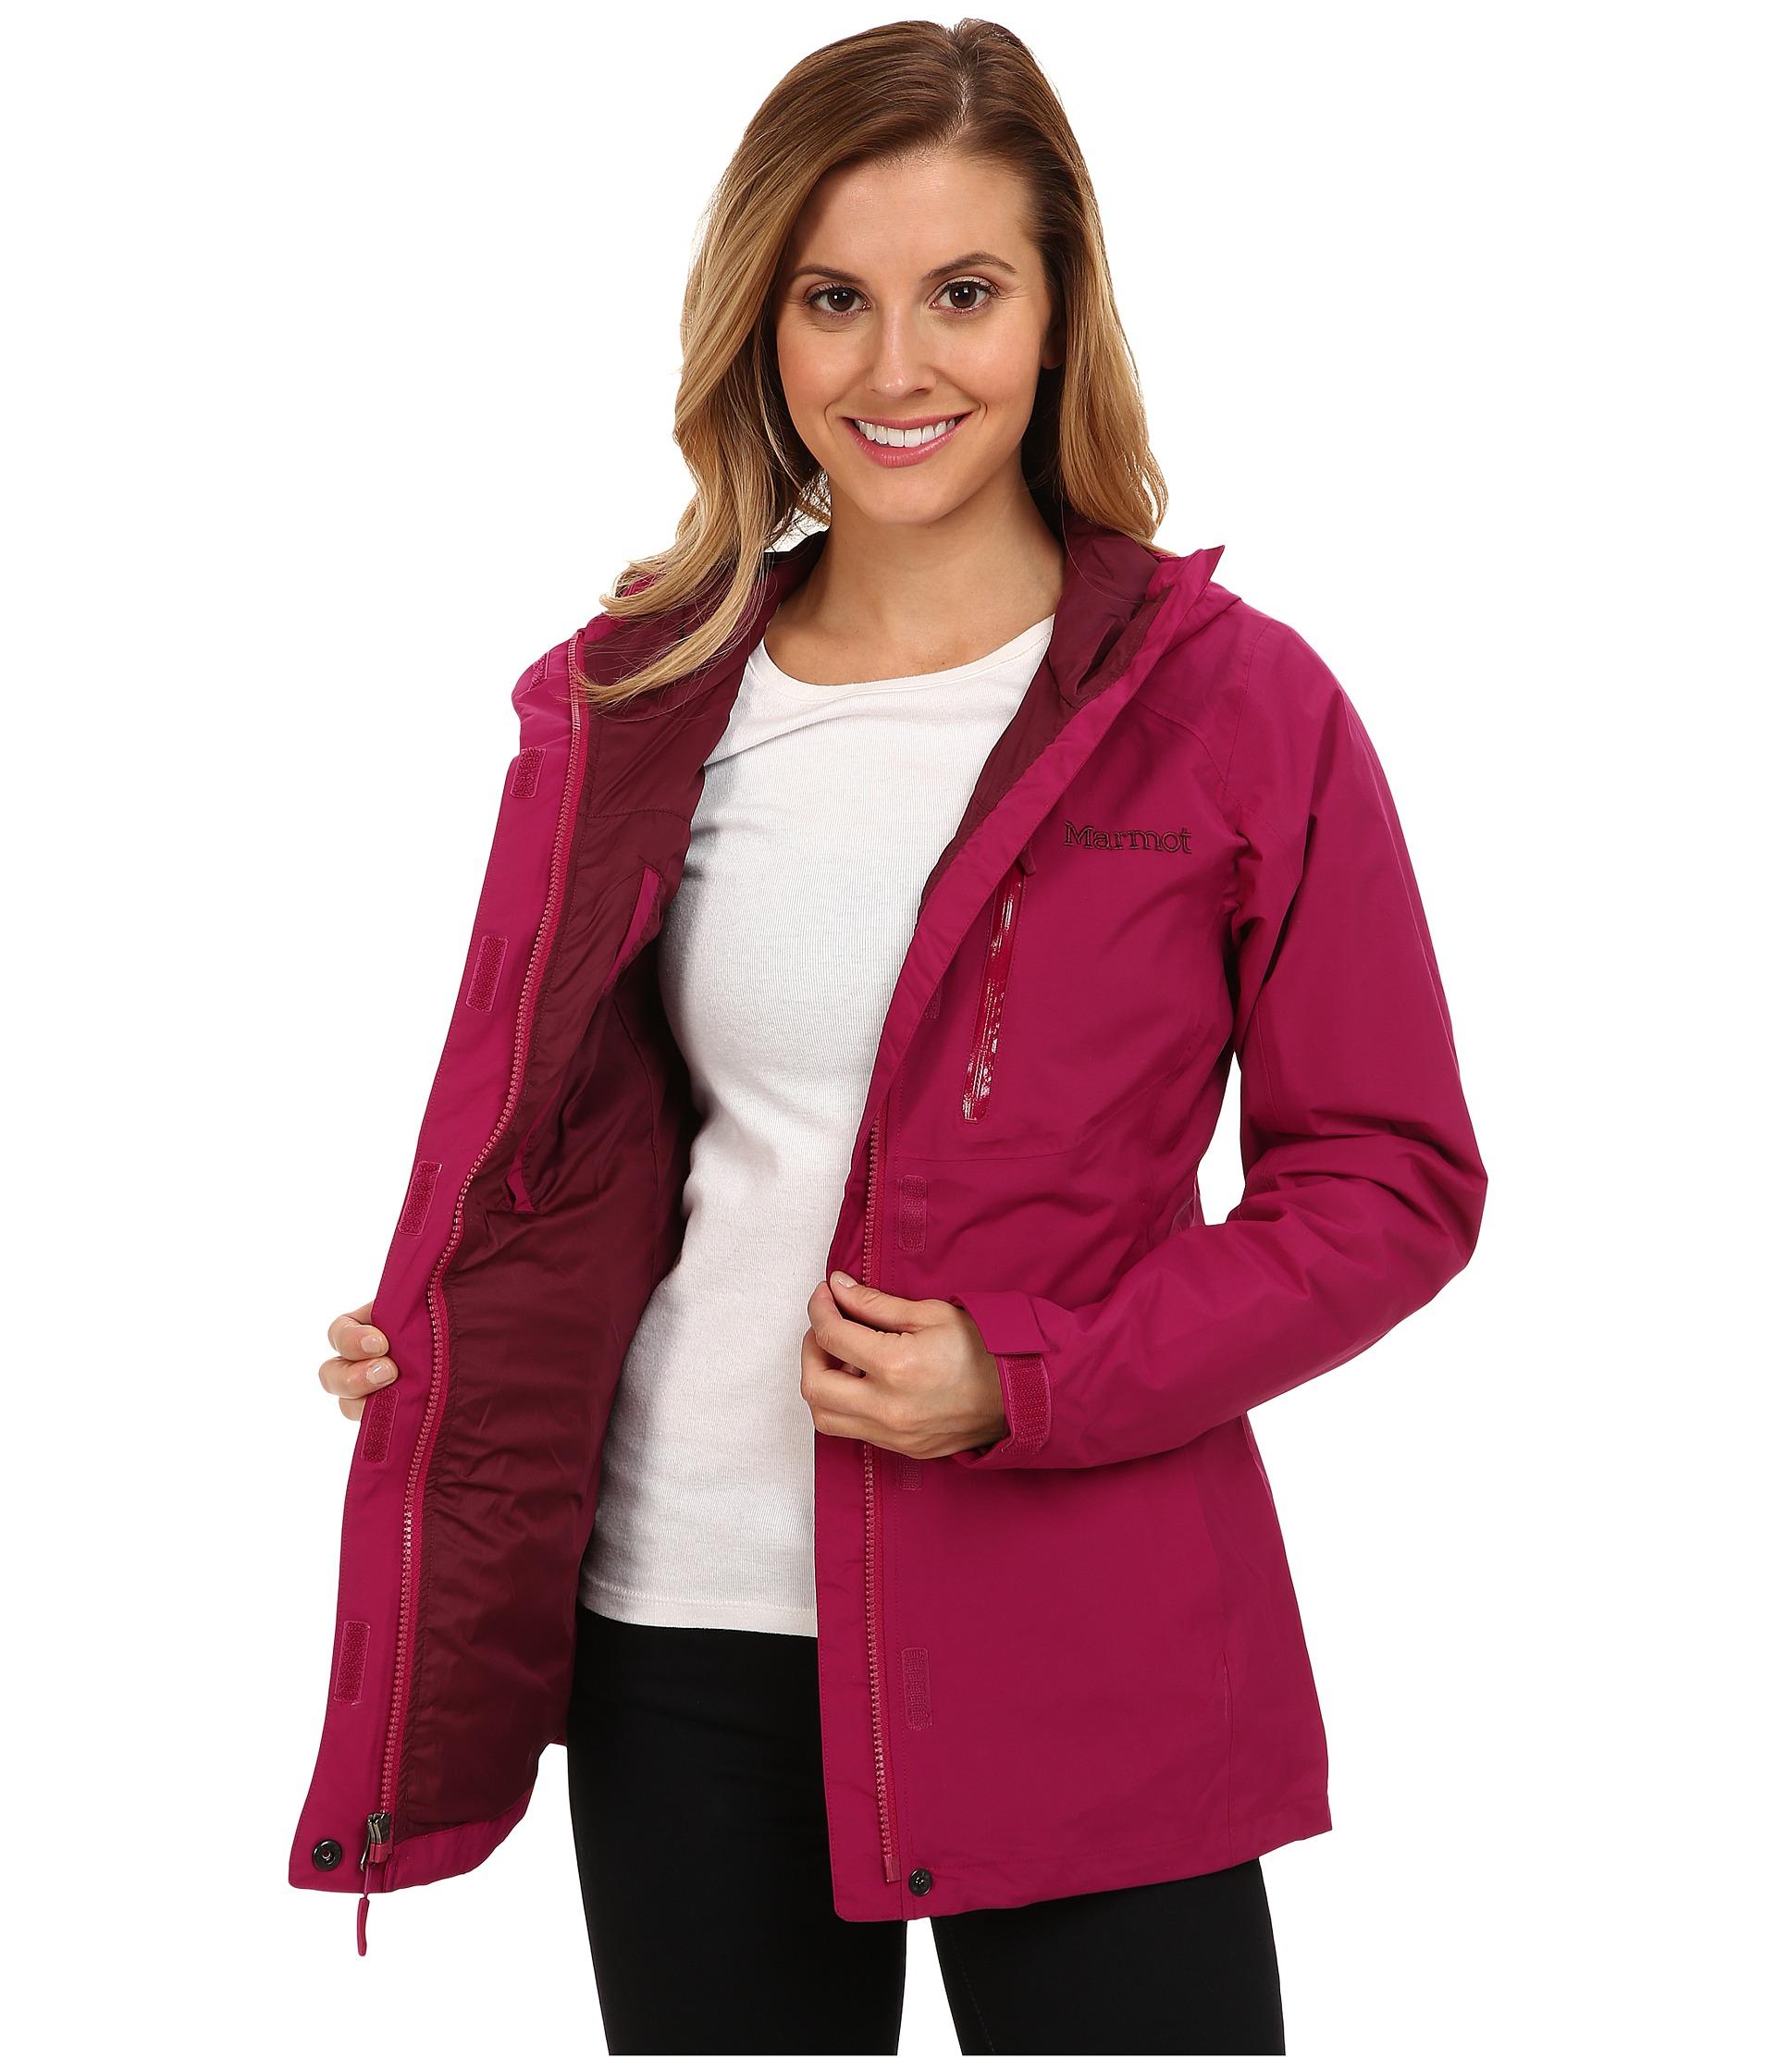 Lyst - Marmot Rincon Jacket in Purple 67eeda261